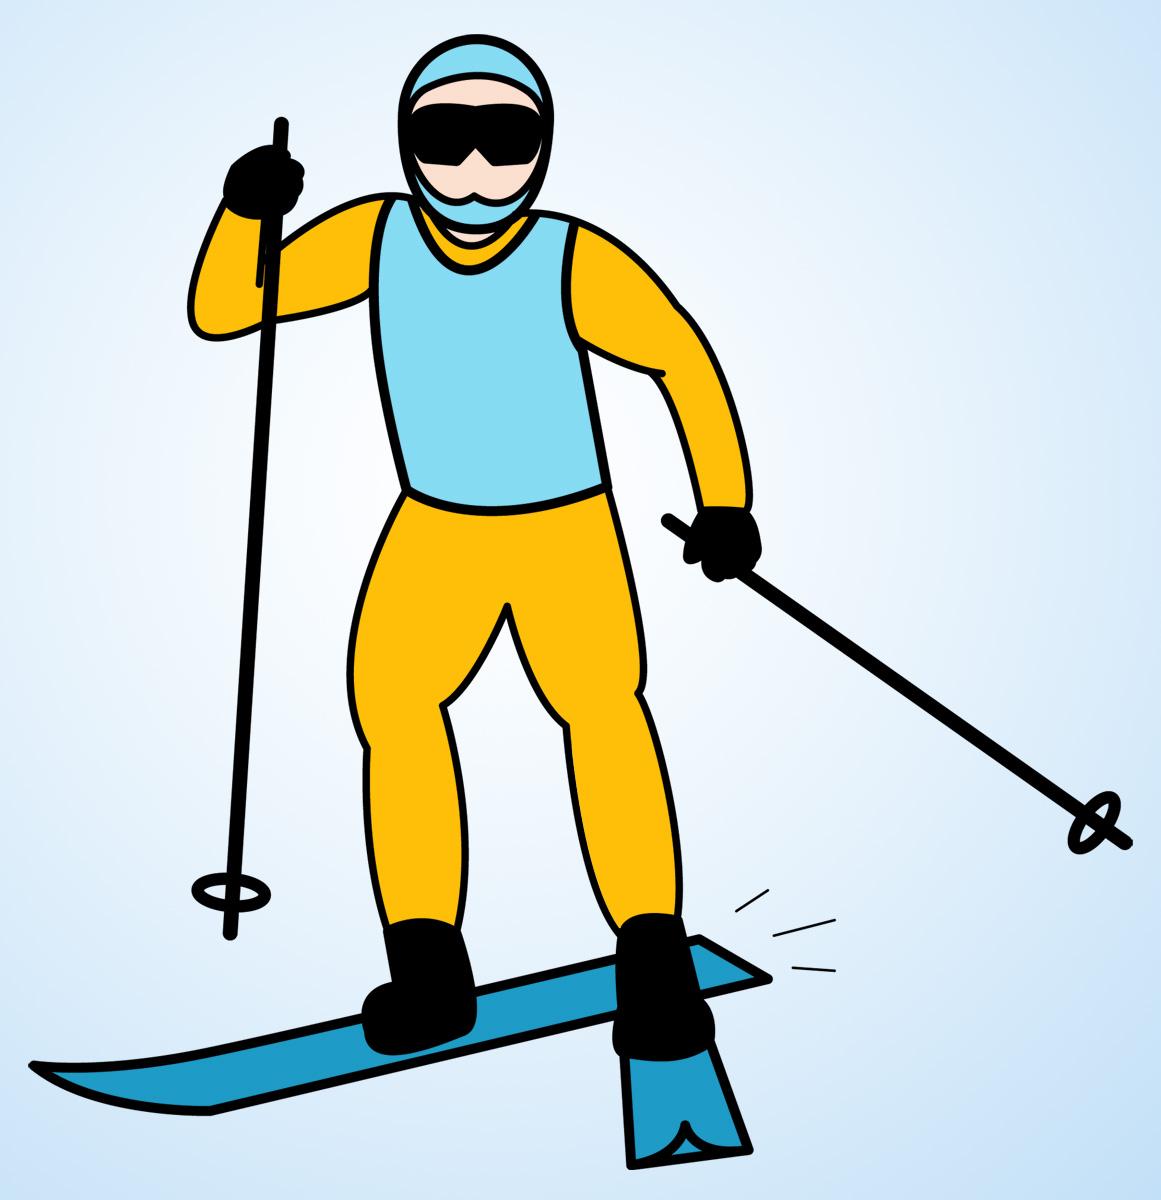 snowboard clipart clipart panda free clipart images ski clipart ski clipart